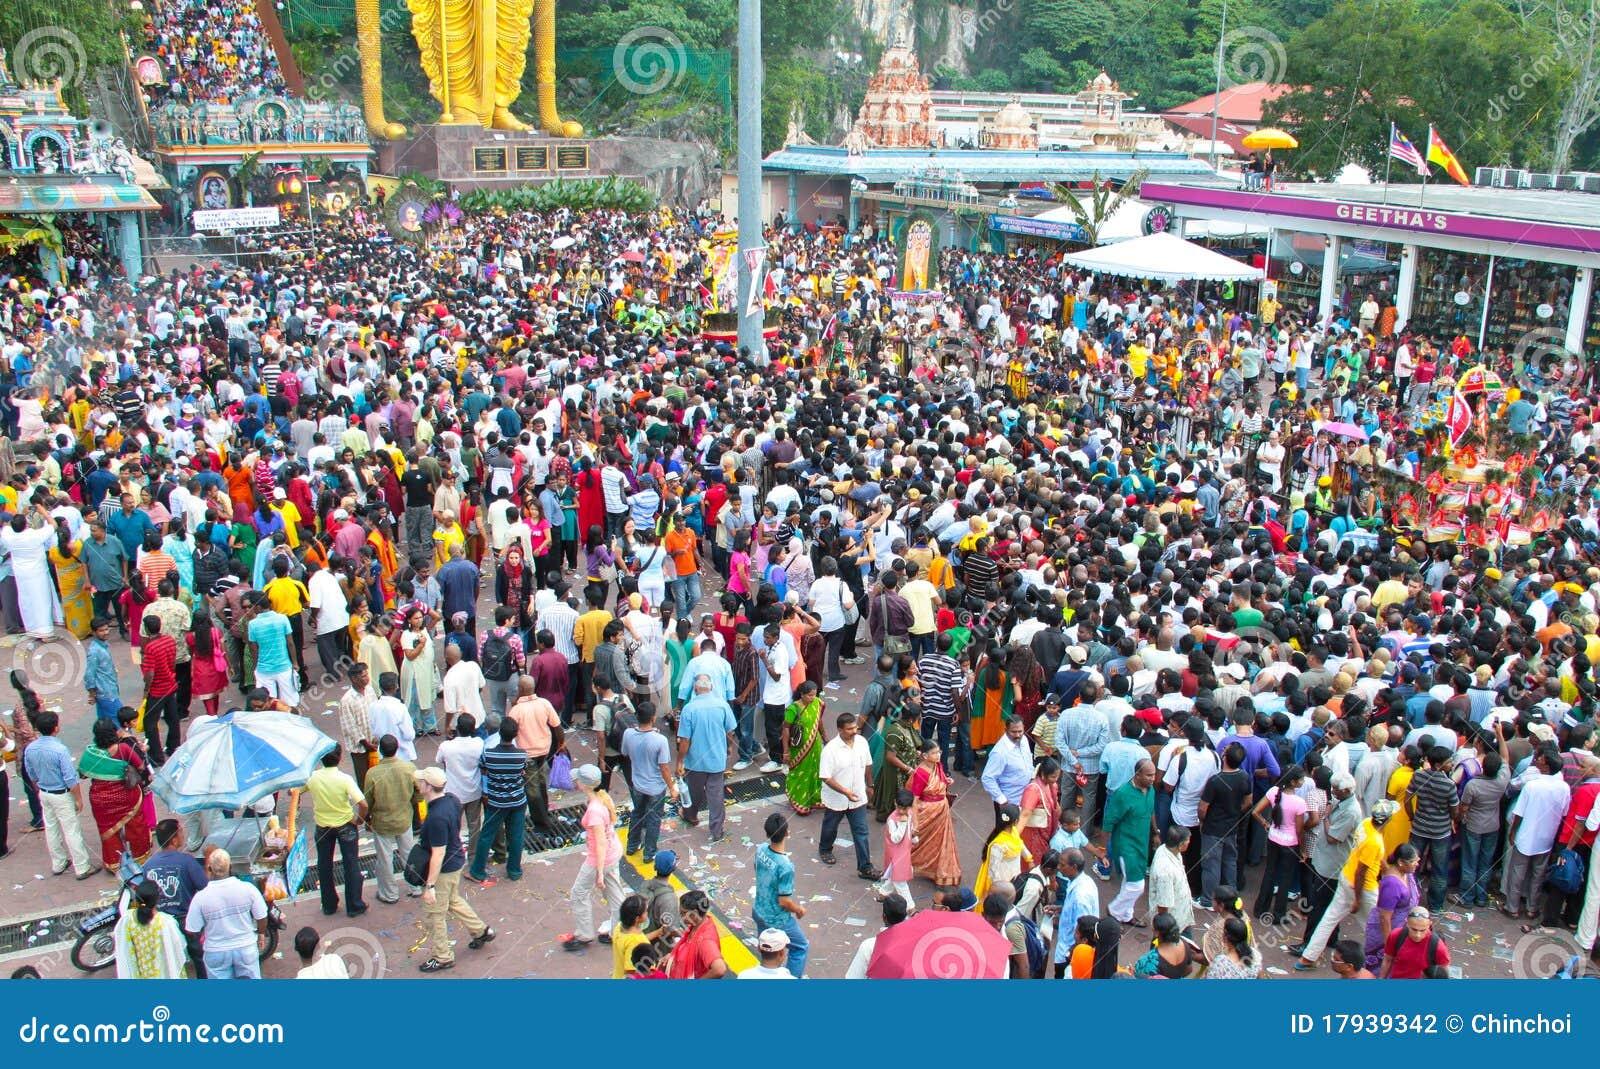 [Image: crowd-batu-cave-thaipusam-festival-17939342.jpg]